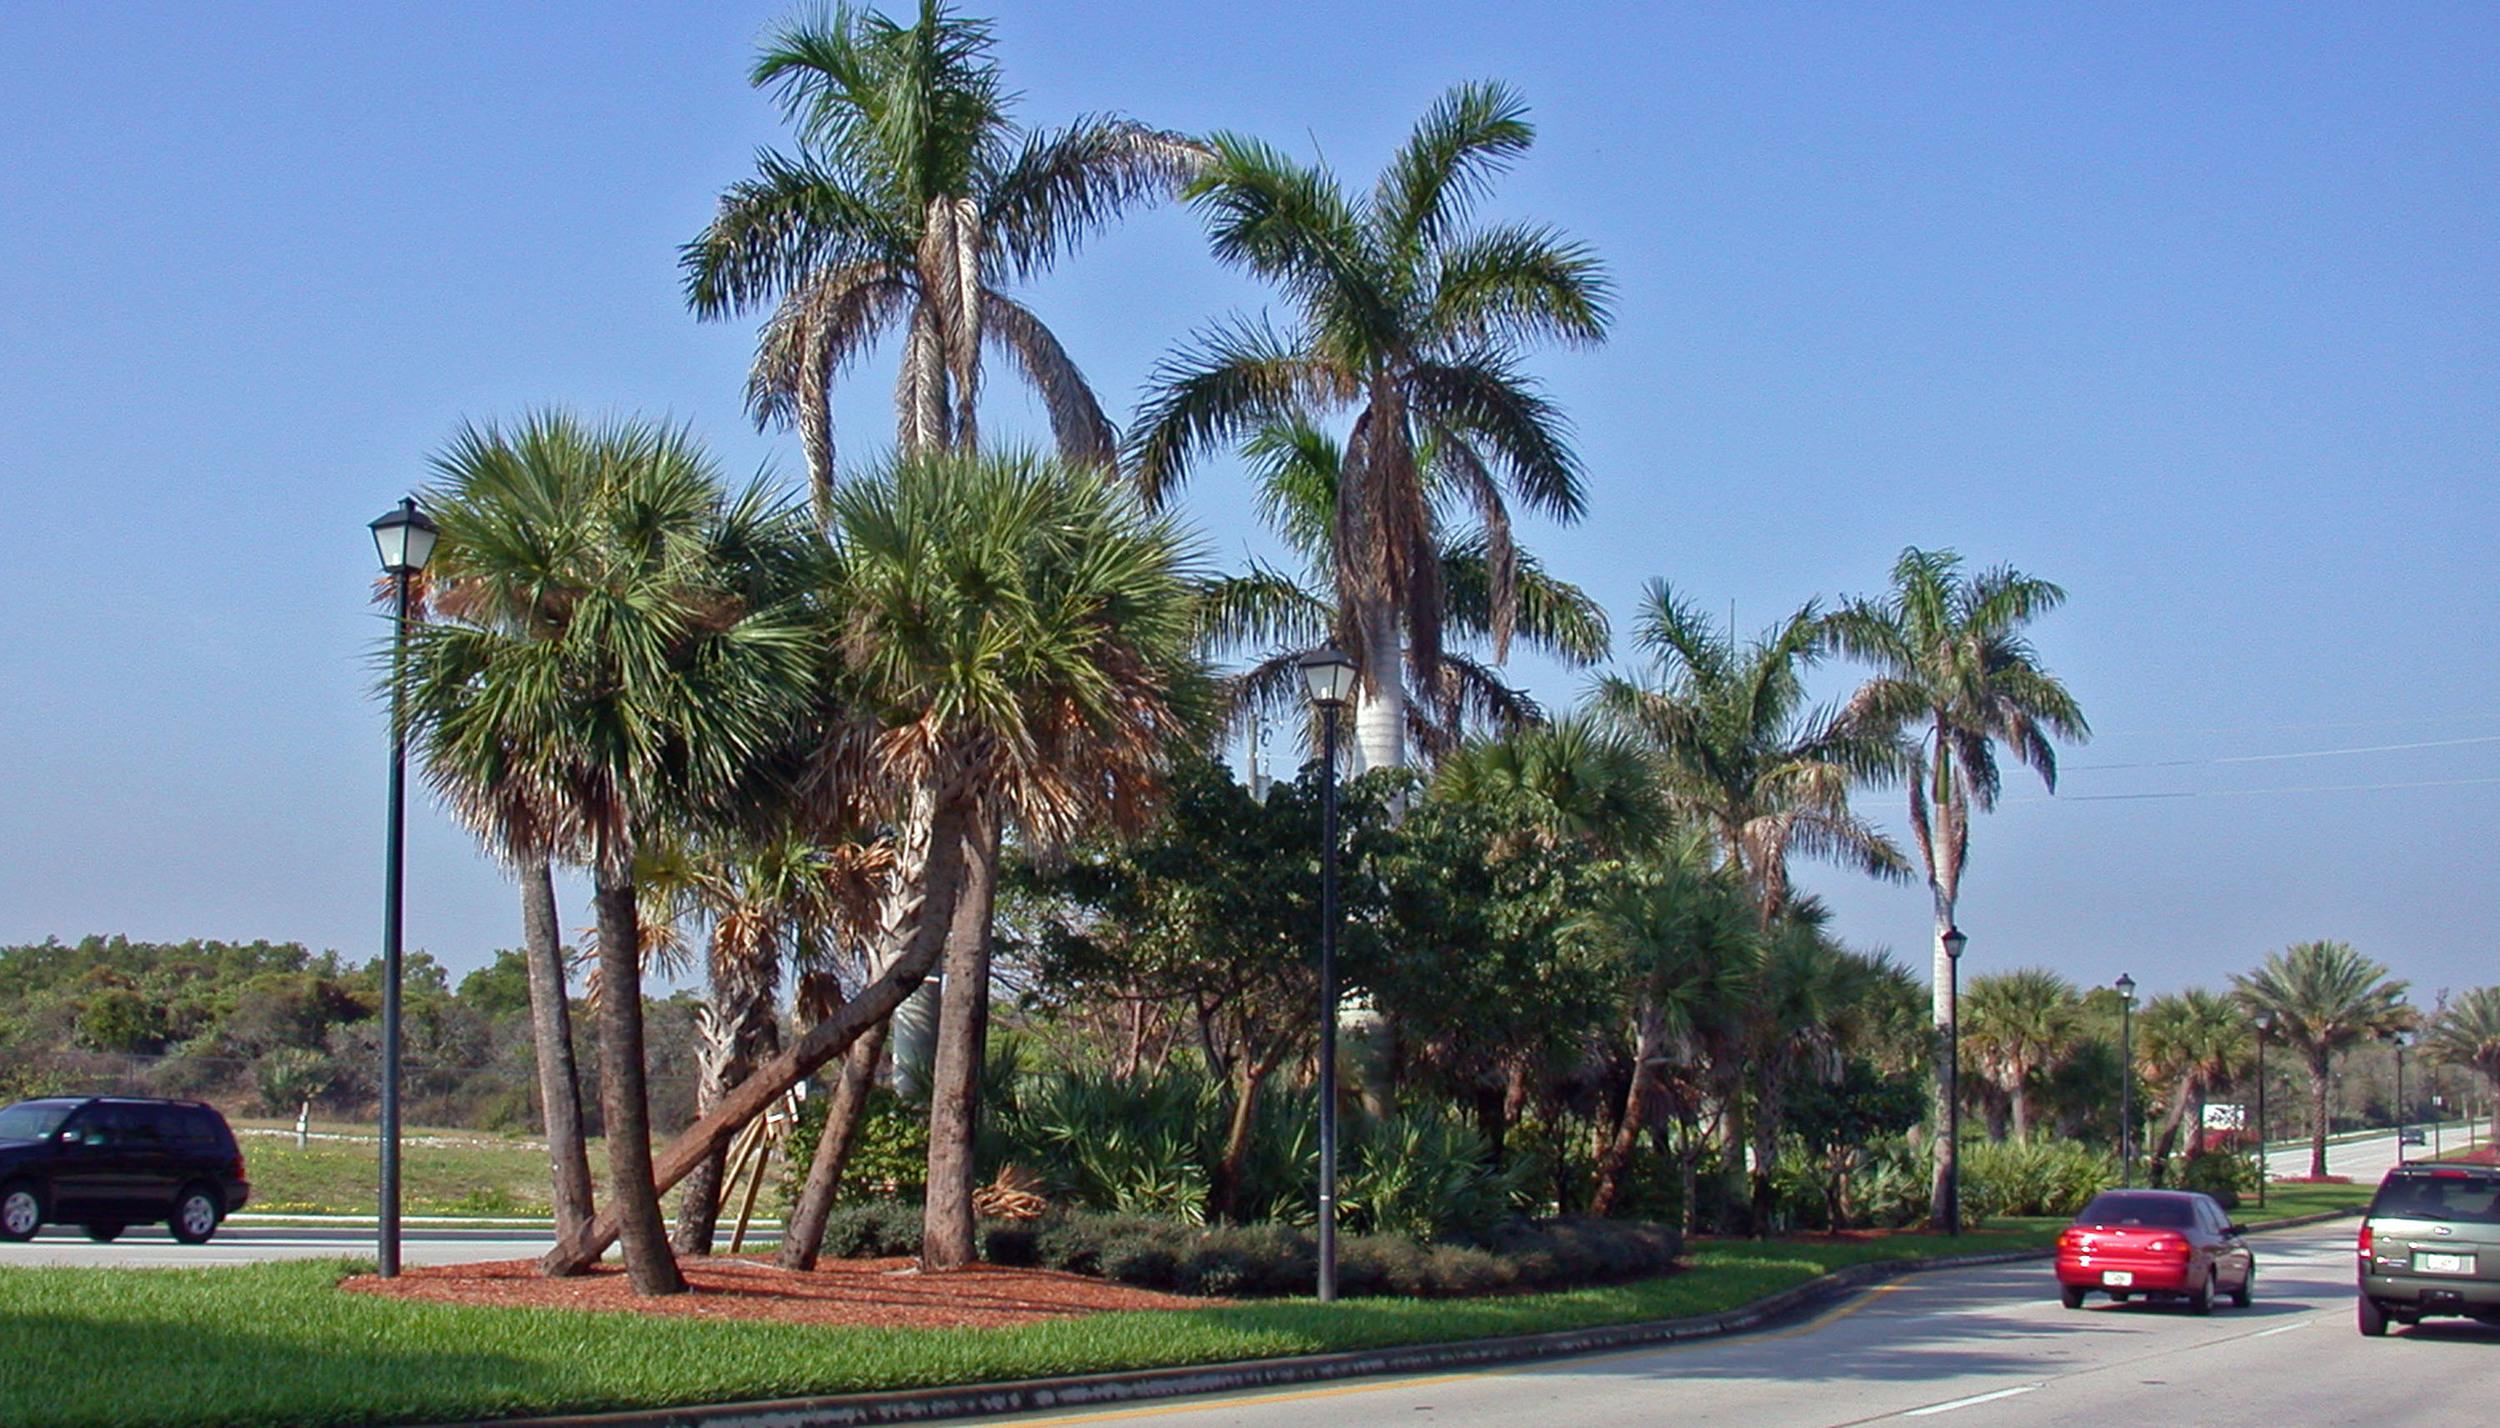 Donald Ross Road Palm Beach County Florida Landscape Native Royal Palms.jpg